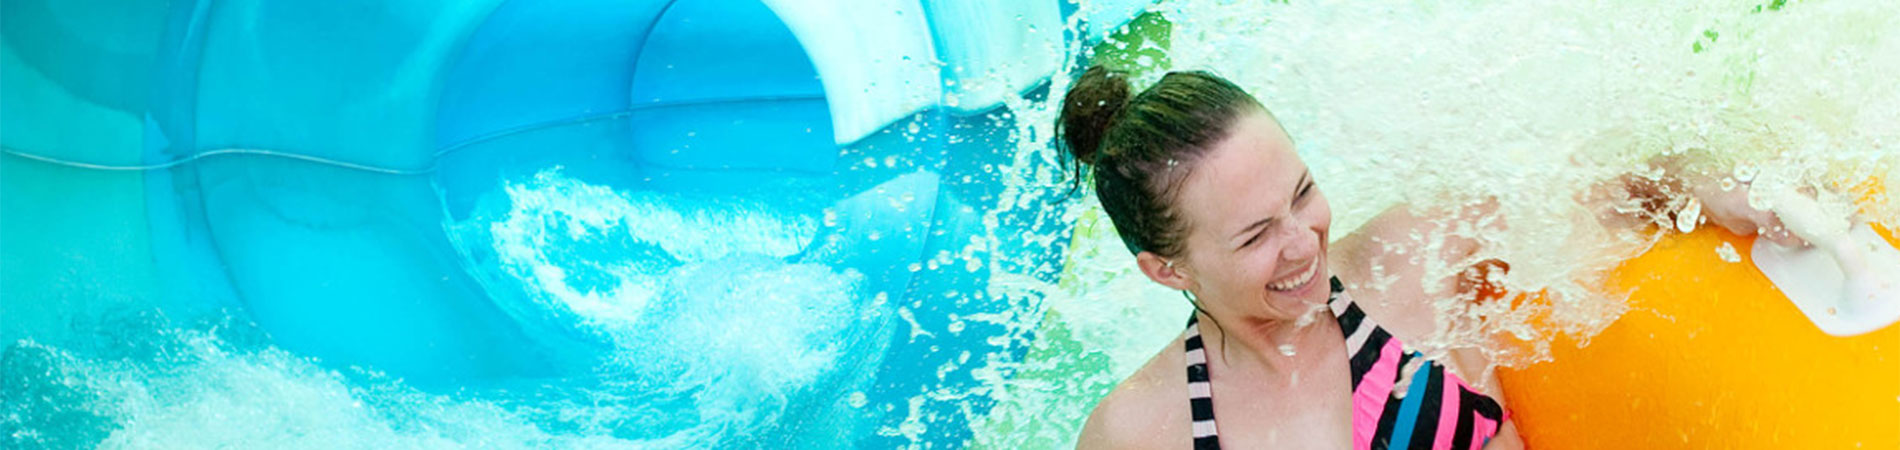 Slide and play at Aquatica, SeaWorld's water park in Orlando, Florida.